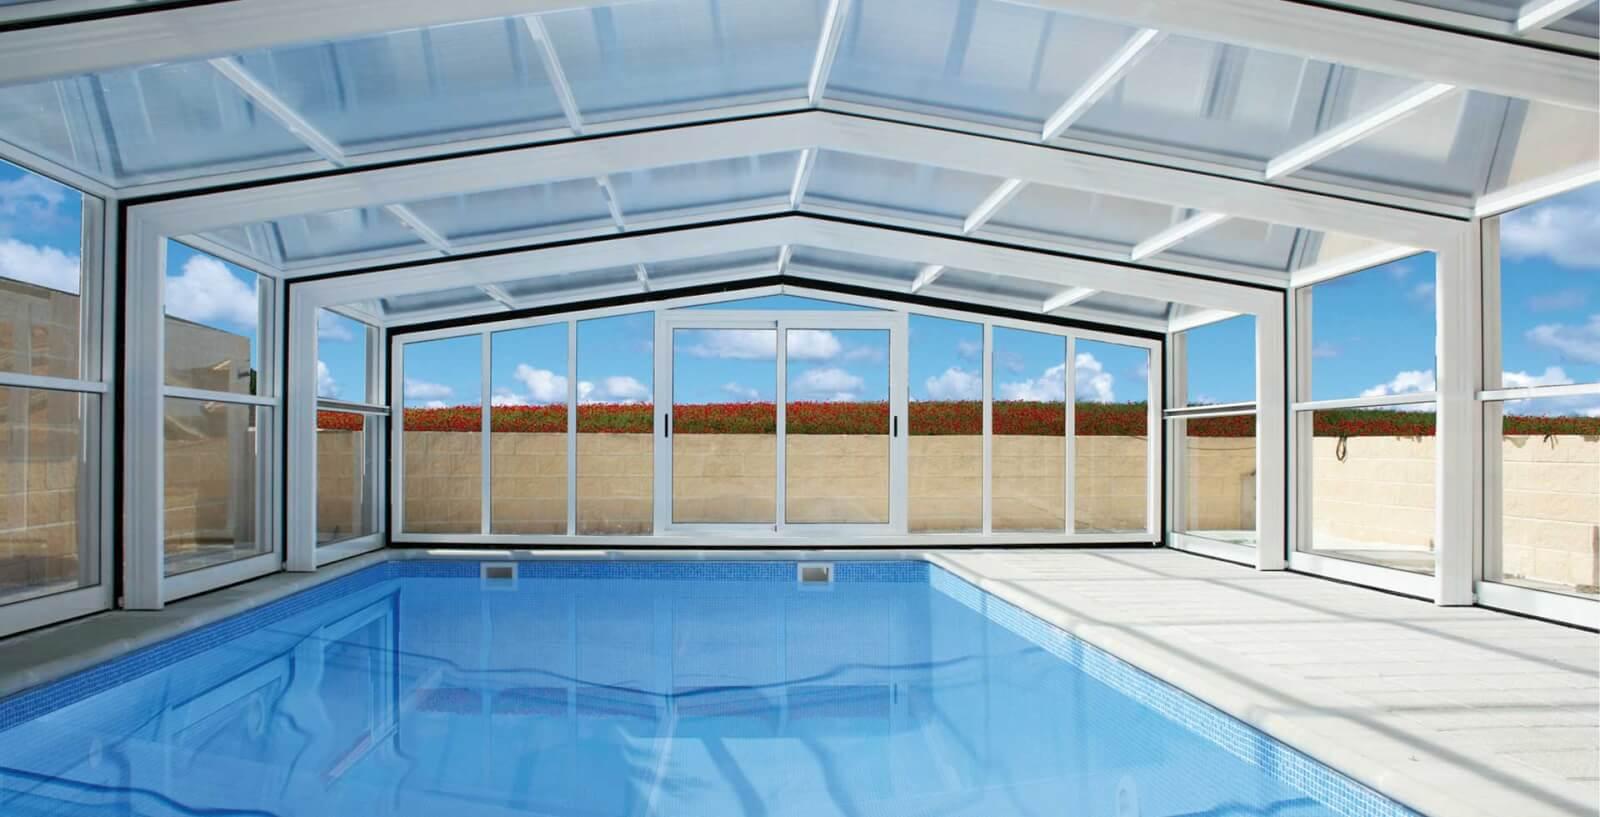 Cubierta de piscinas policarbonato modelo izalco tecnyban for Piscina quart de poblet cubierta